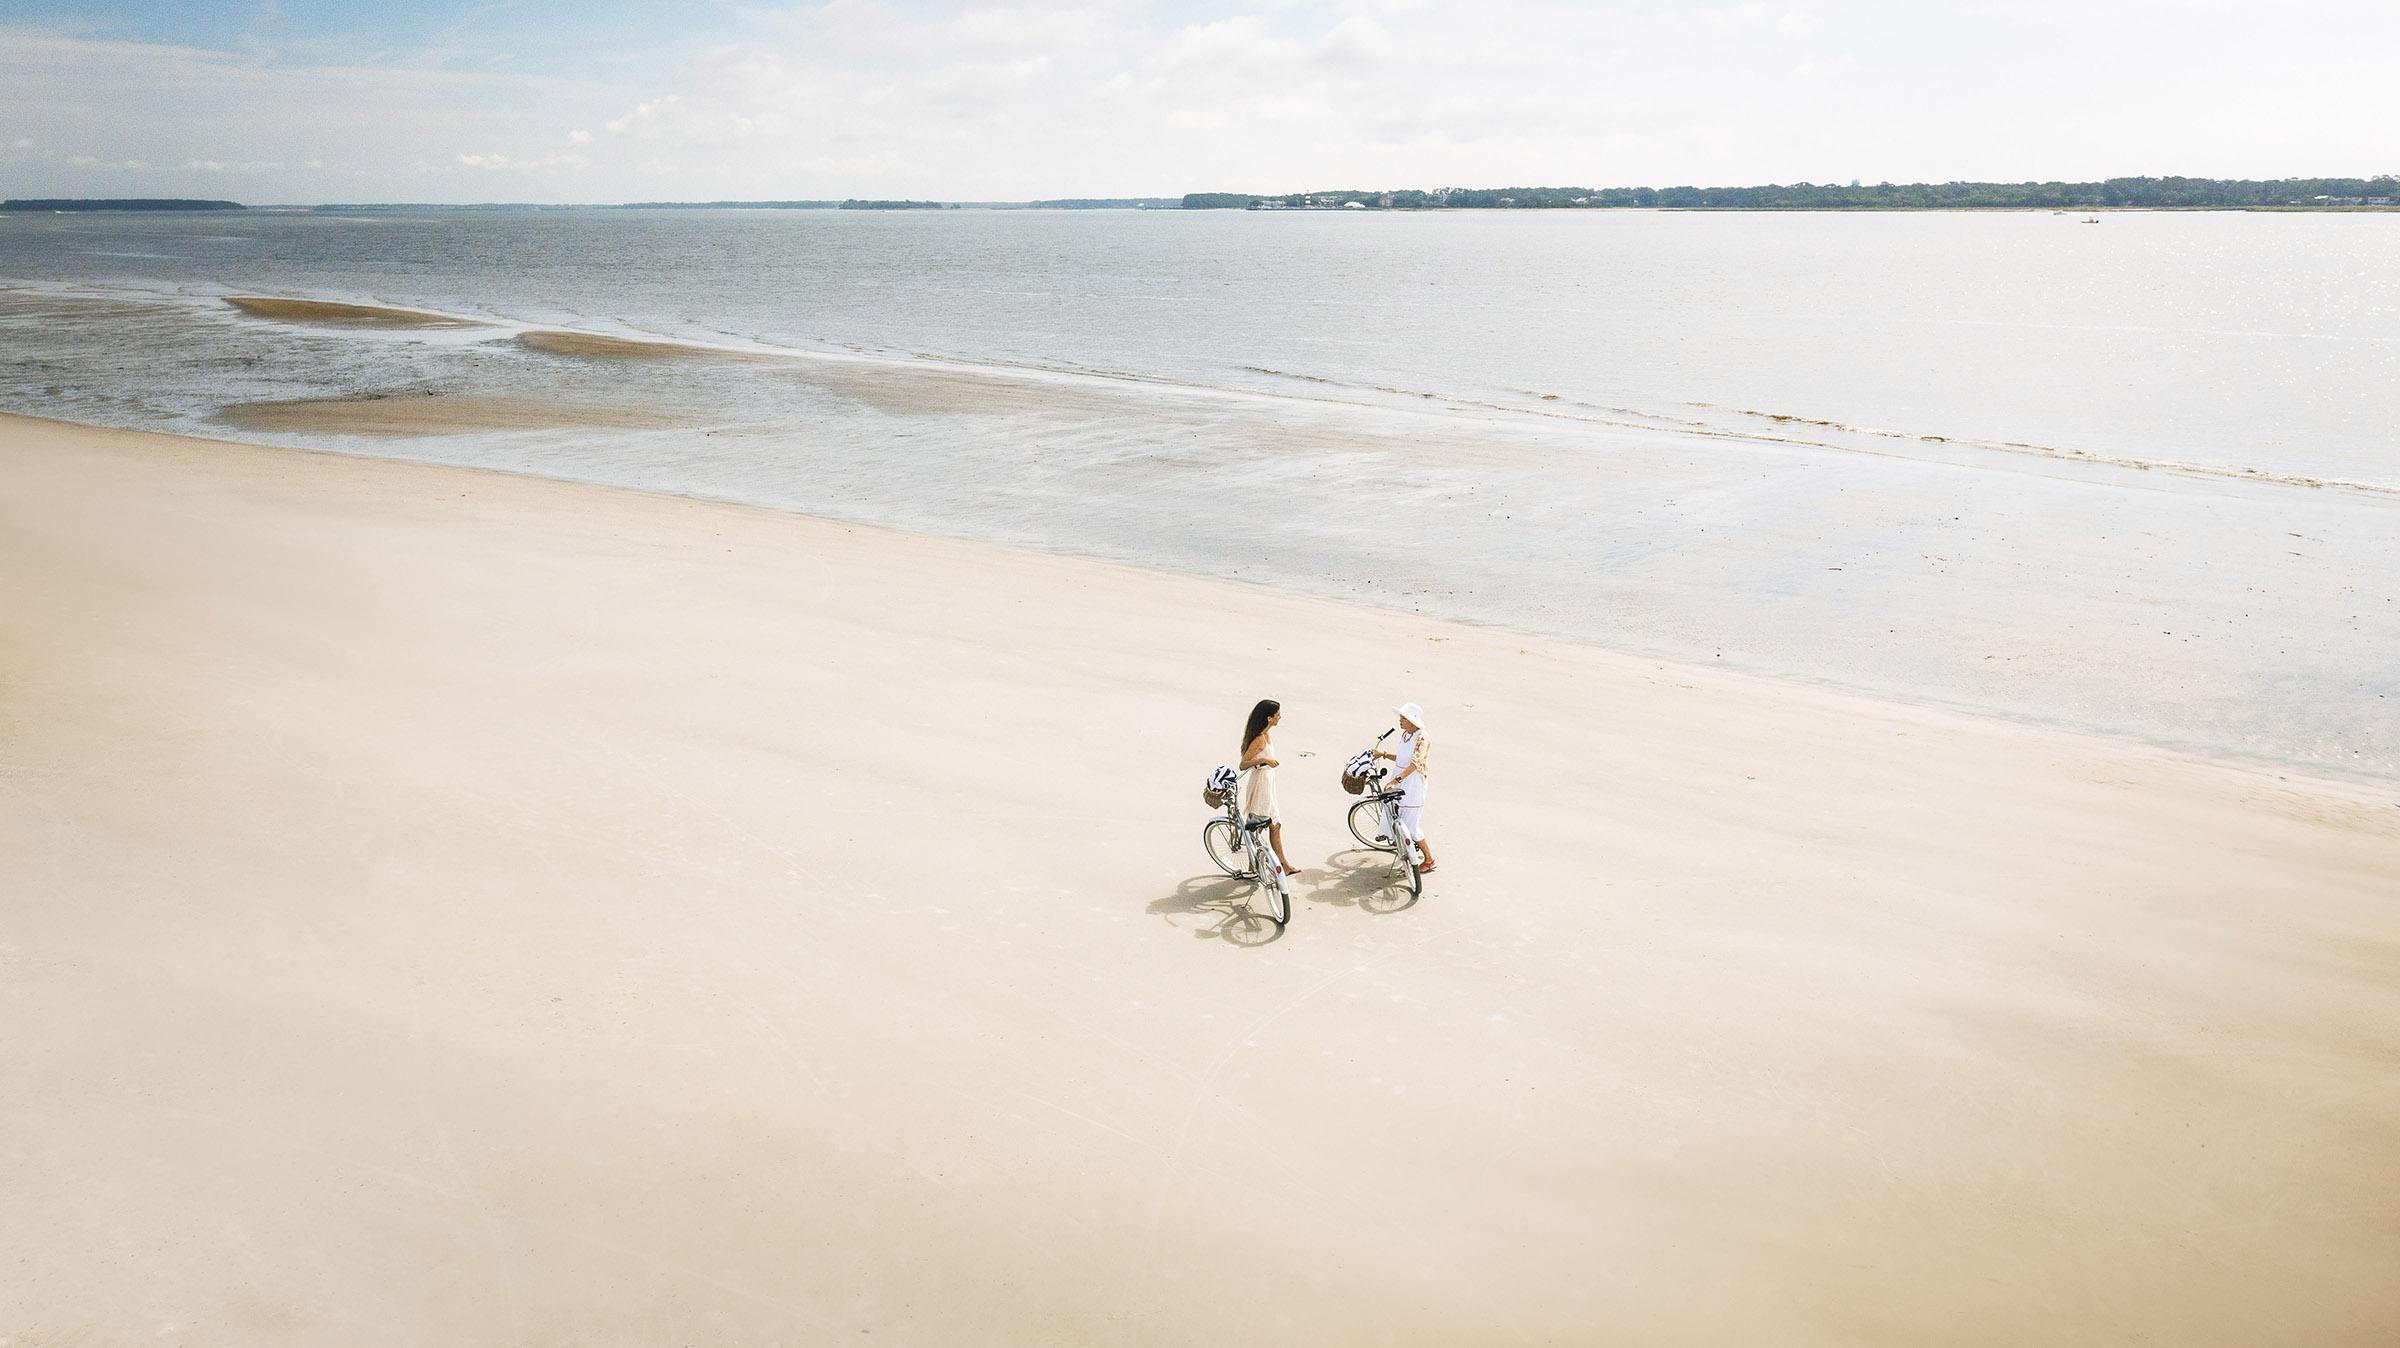 Biking beach Daufuskie Island